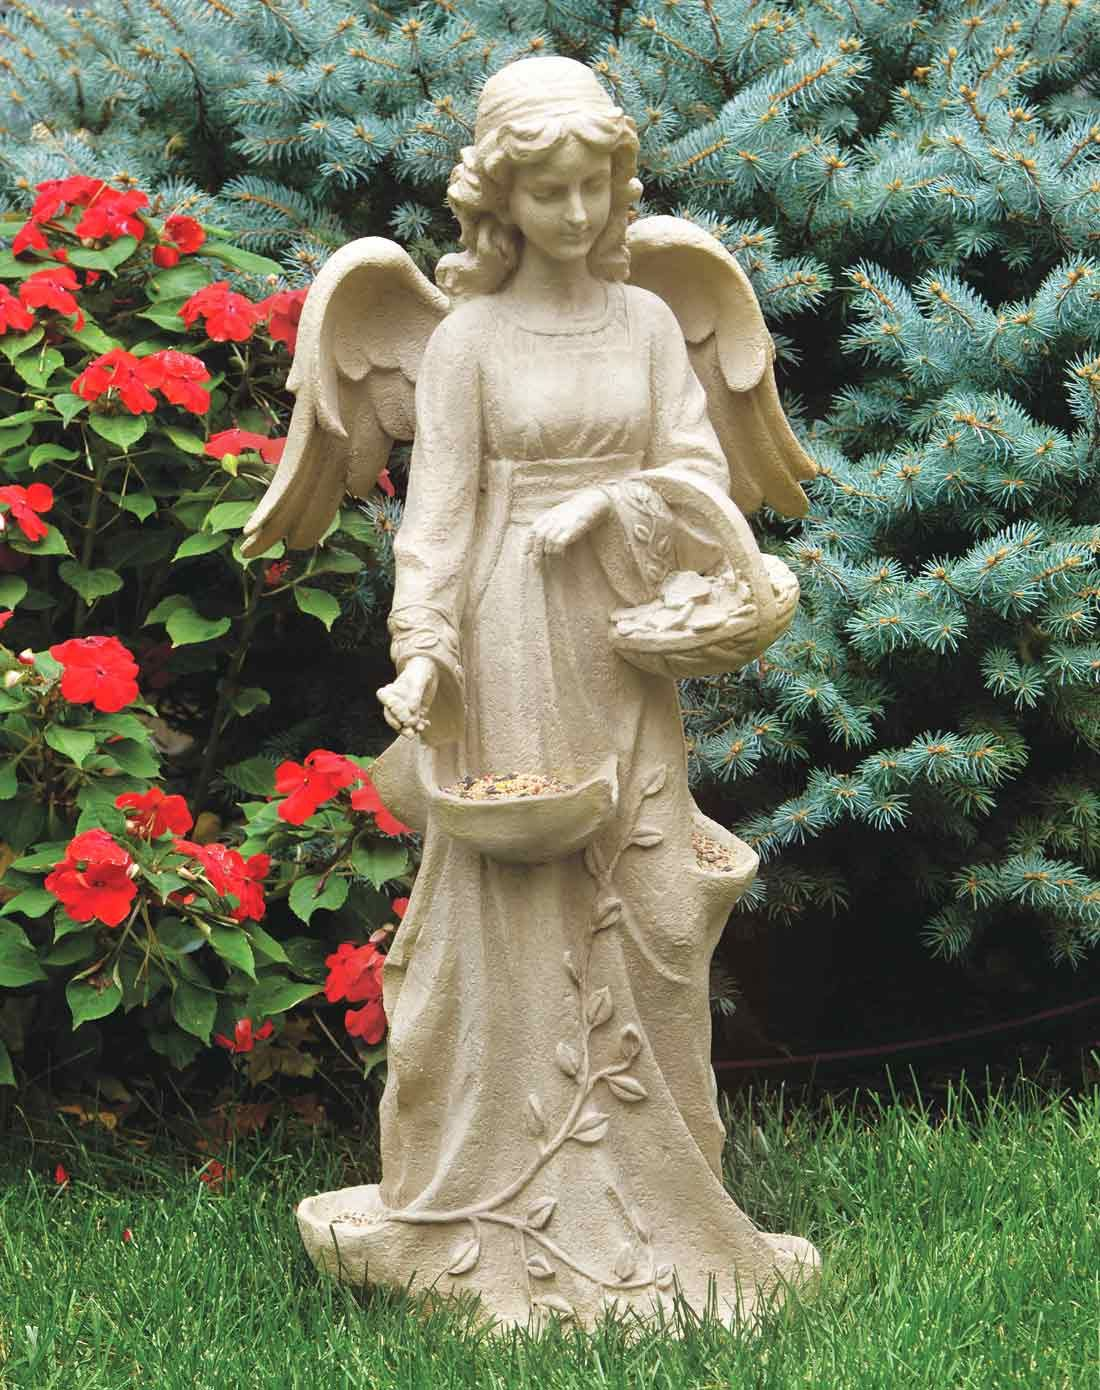 Pin By Lasalete Piedade On Angel Art Garden Statues Angel Statues Statue